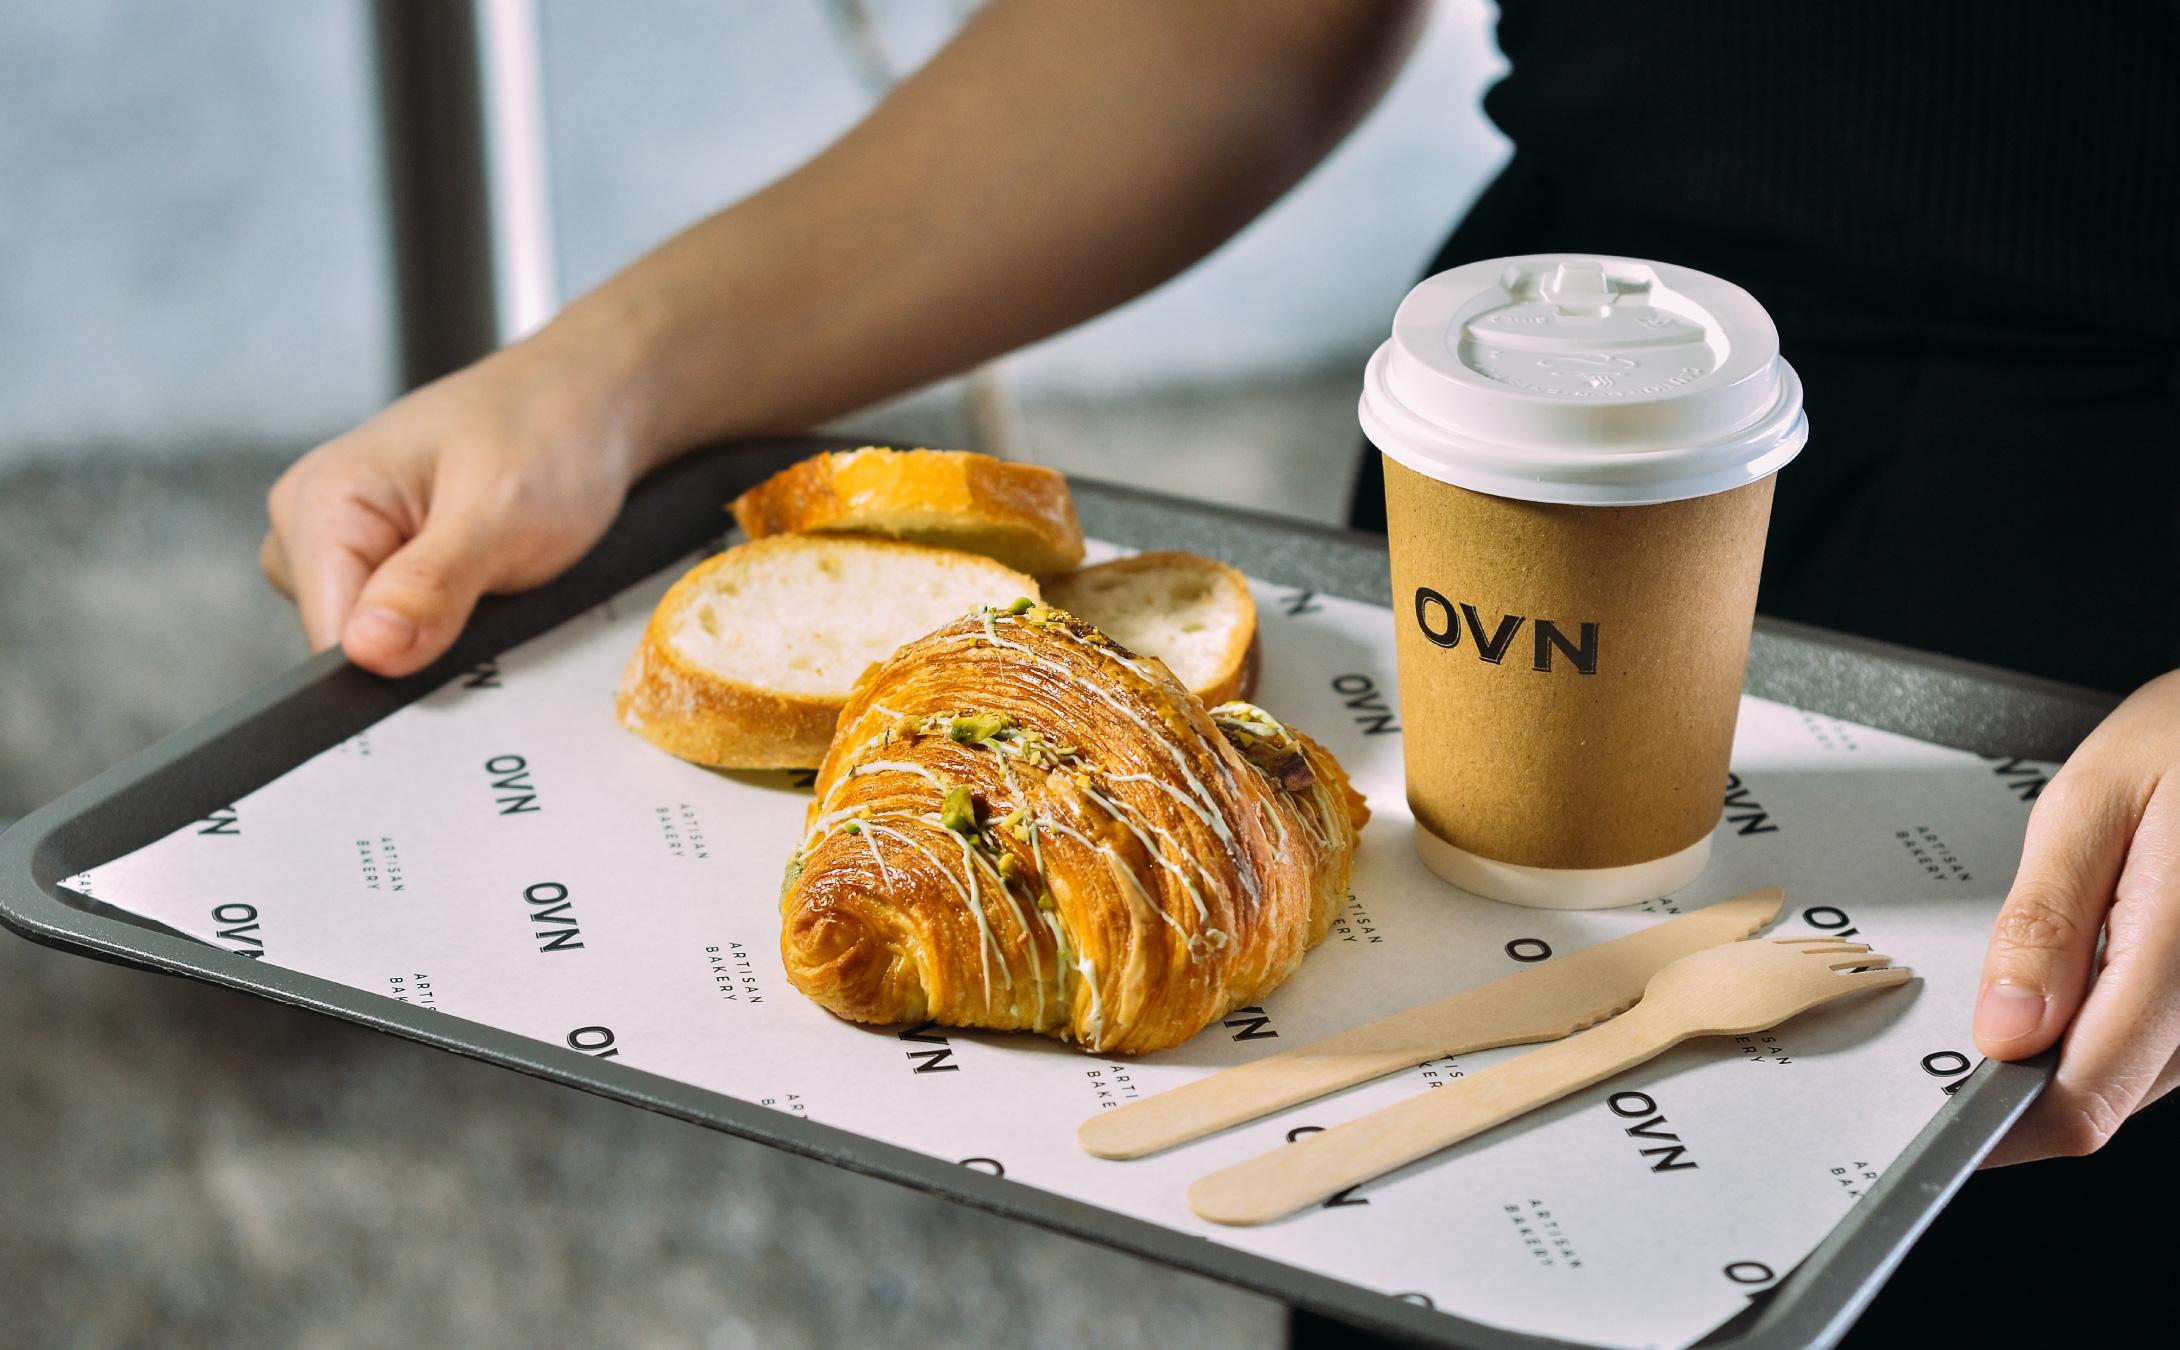 Brand Identity Design for Ovn Artisan Bakery by Pitustudio